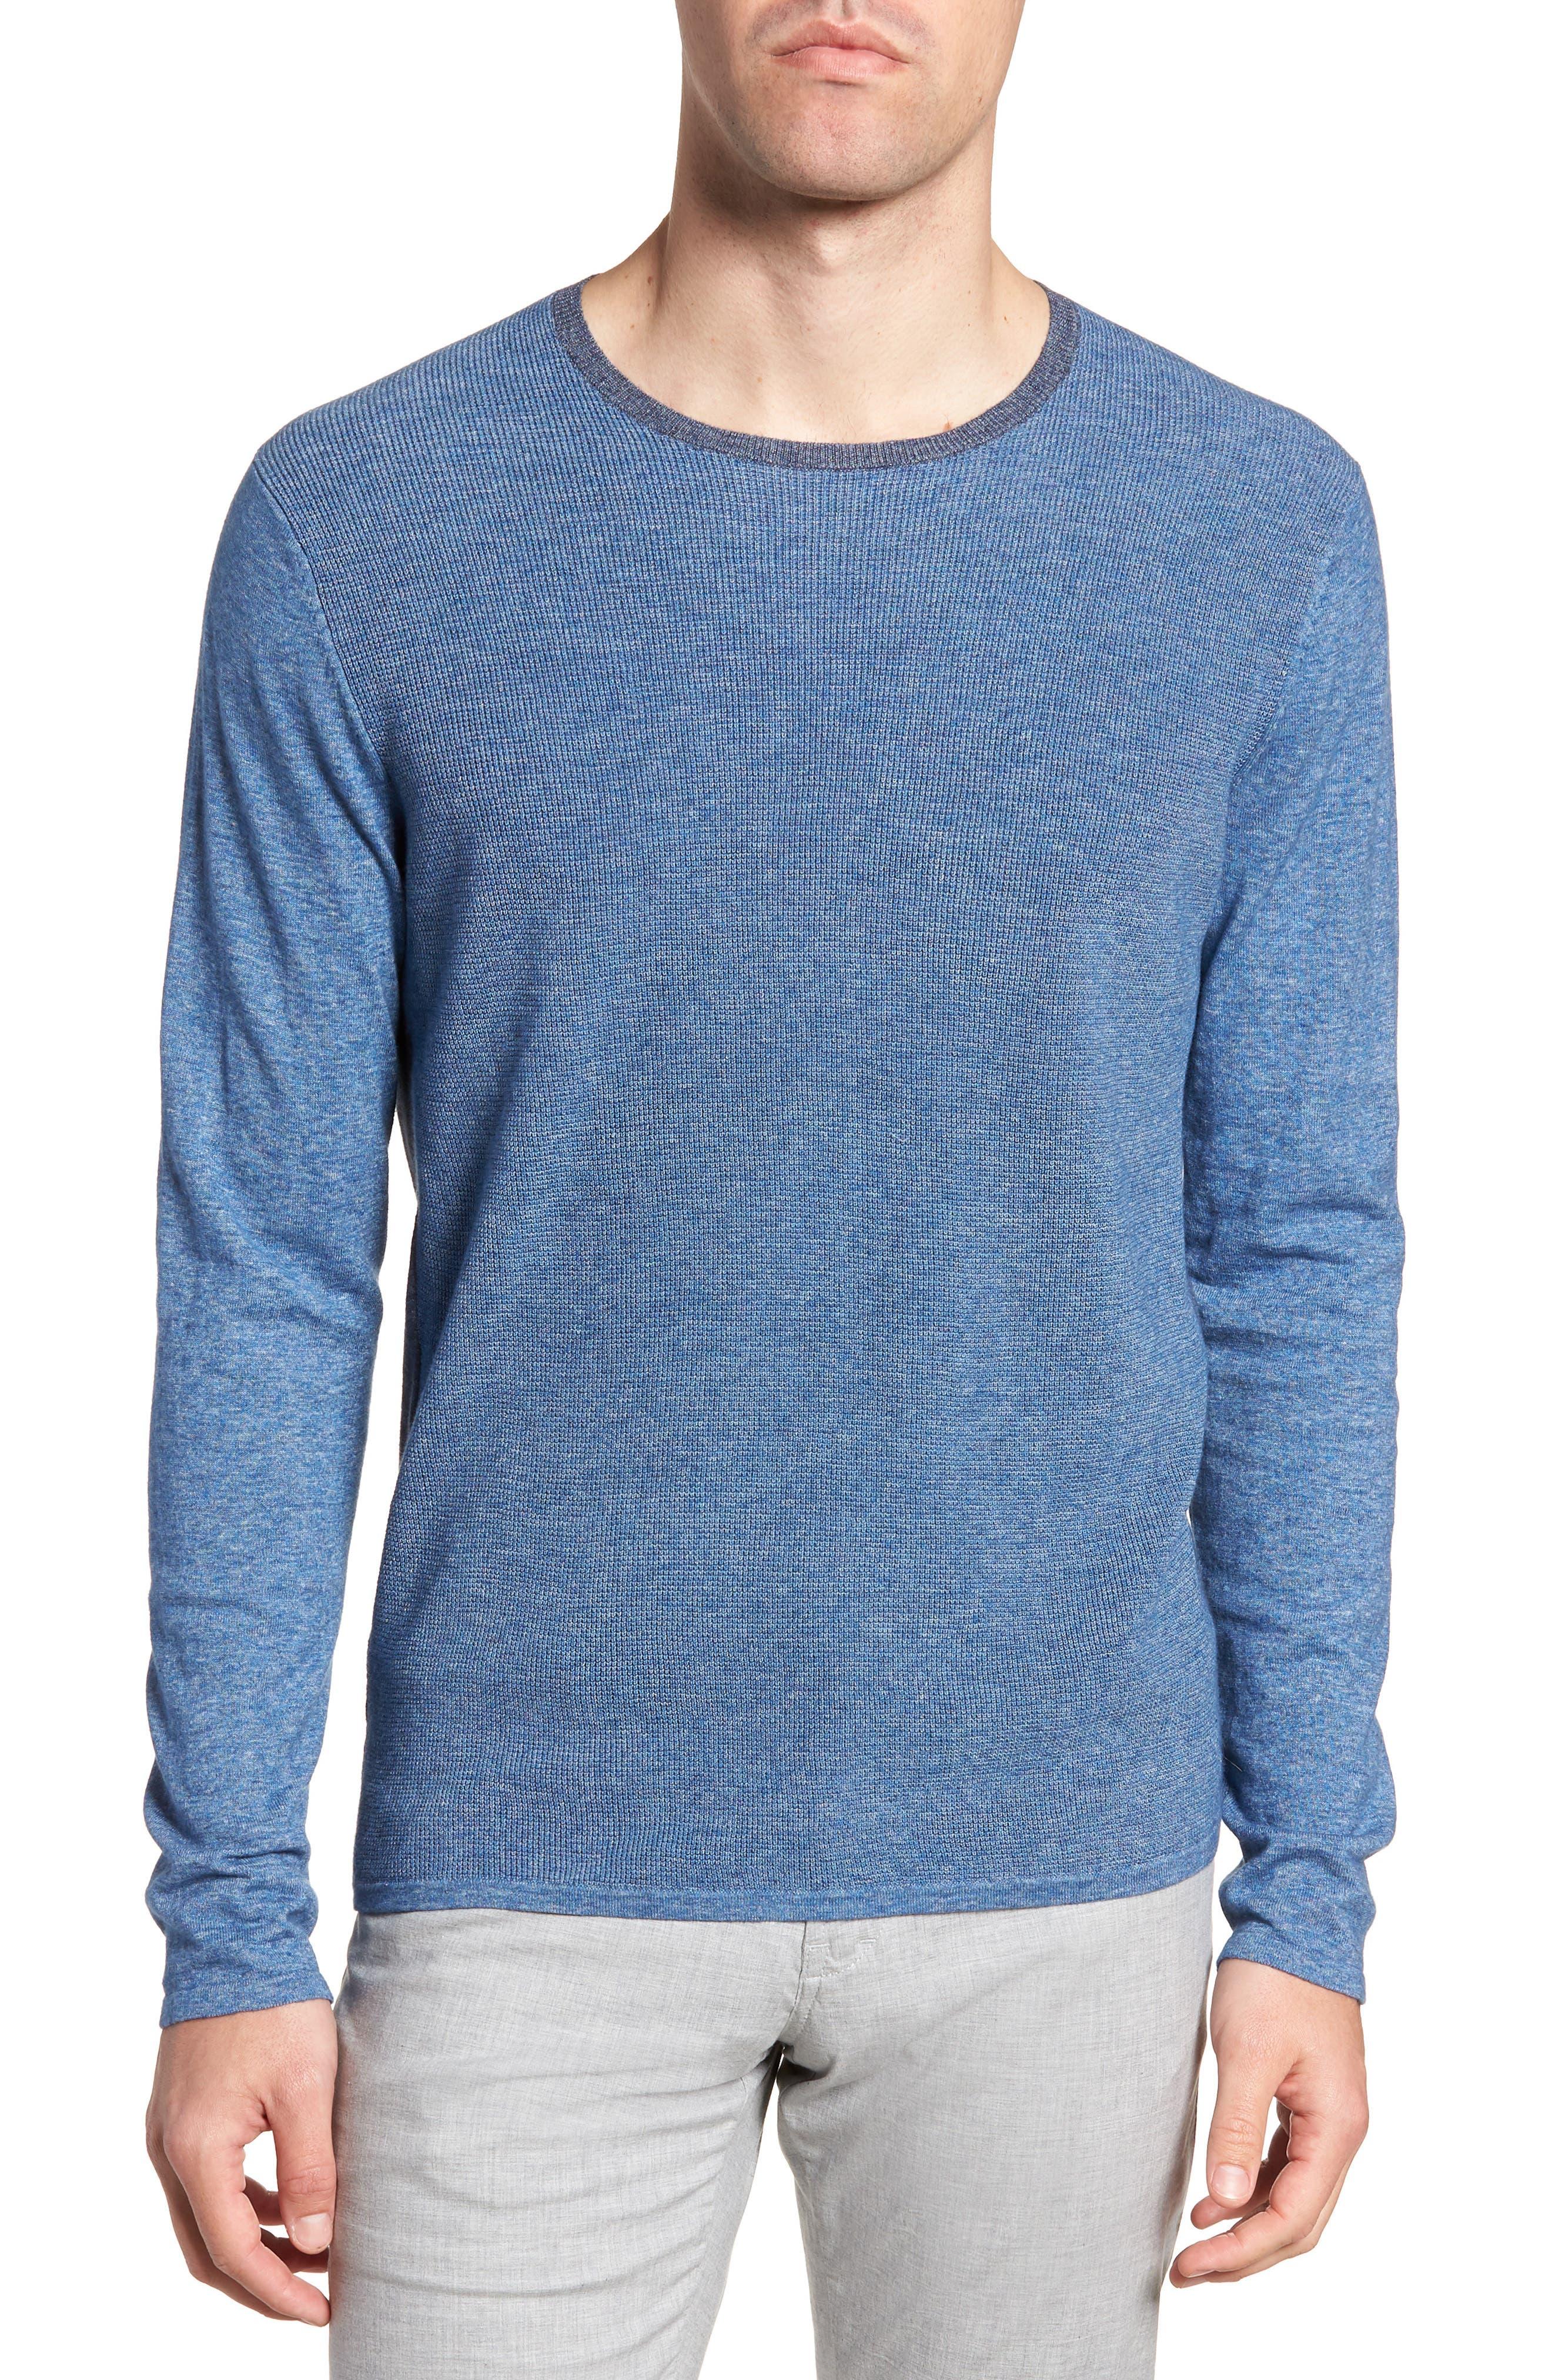 Lakeside Sweater,                         Main,                         color, Denim Heather